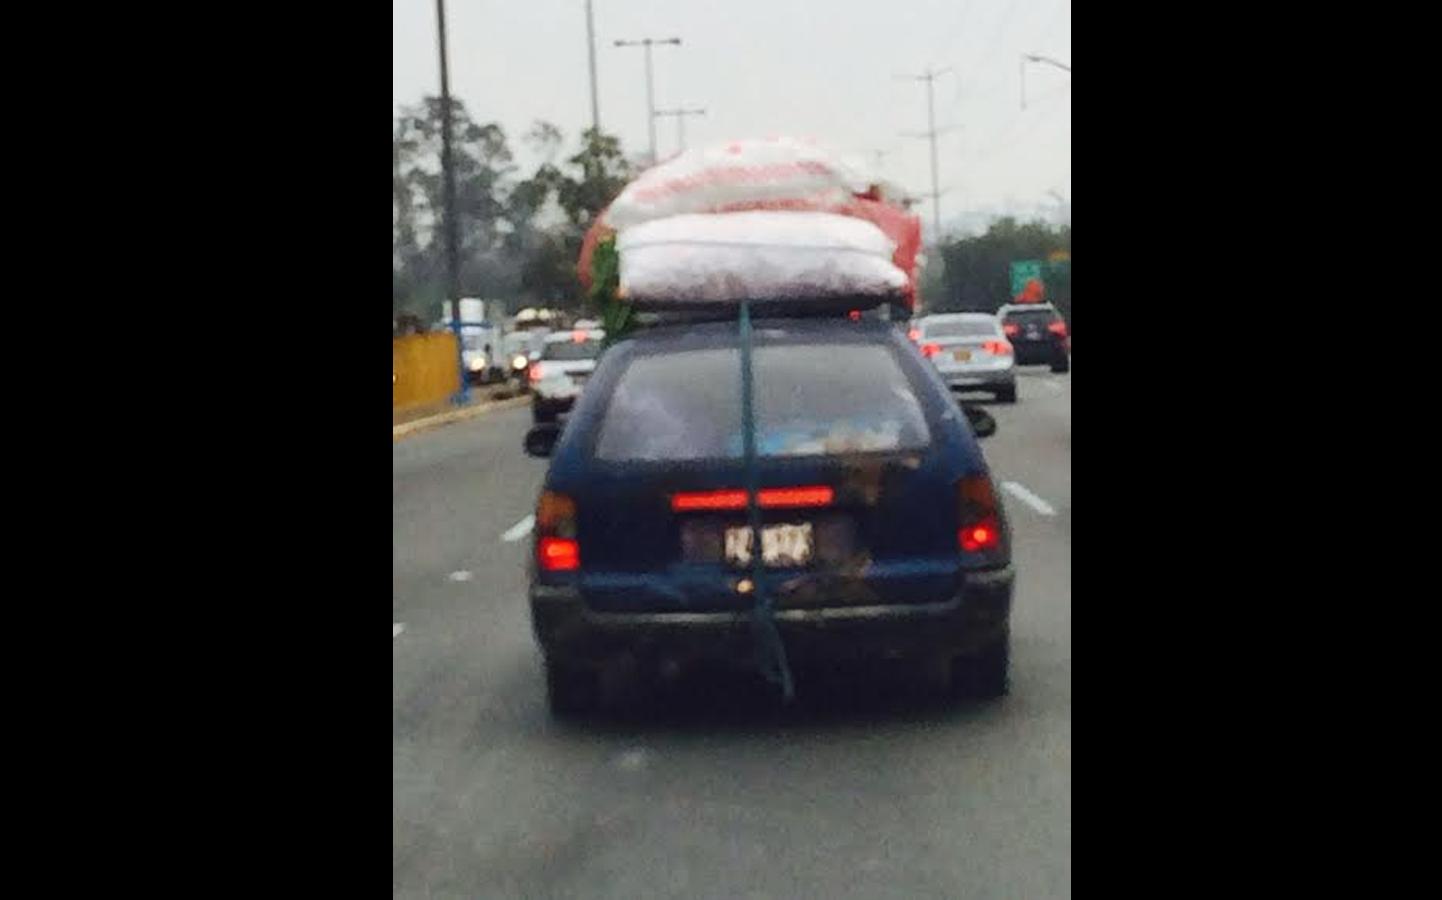 Una usuaria reportó este vehículo que transporta sacos a la altura del puente El Derby (FOTO: WhatsApp/Maritsa Silva)